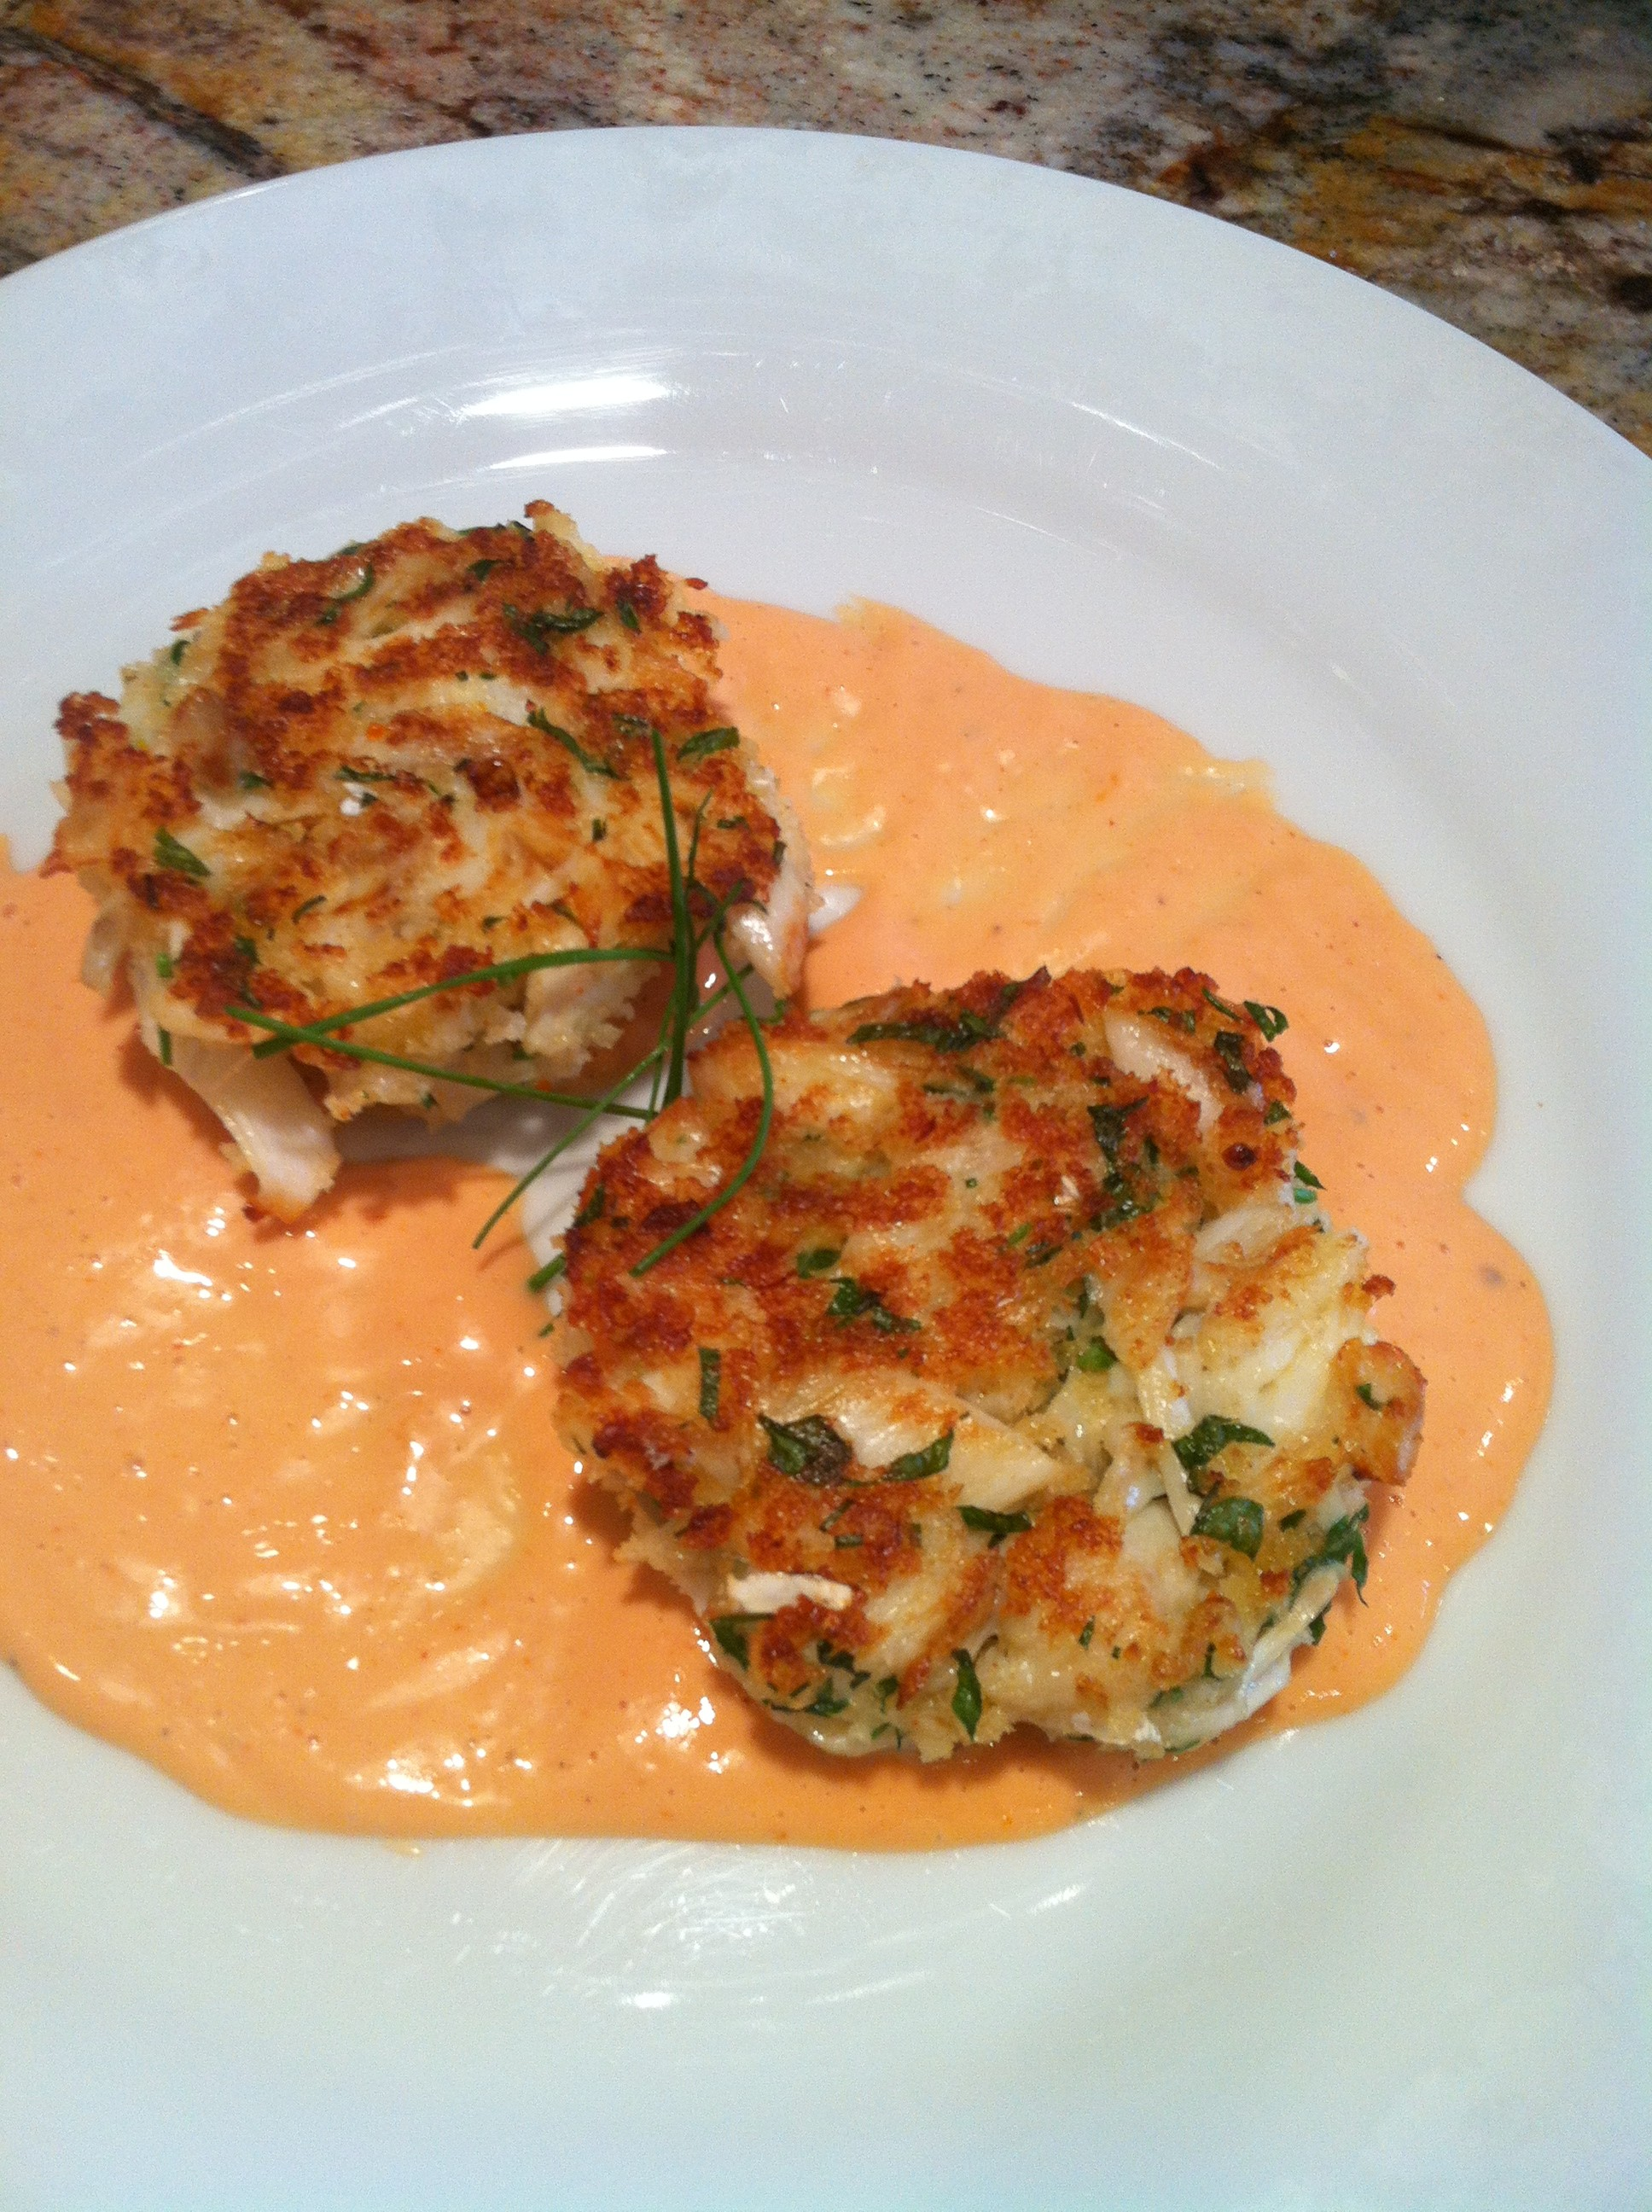 Crab Cakes with Yerbaniz Mayo – Tortas de Jaiba con Mayonesa de Yerbaniz